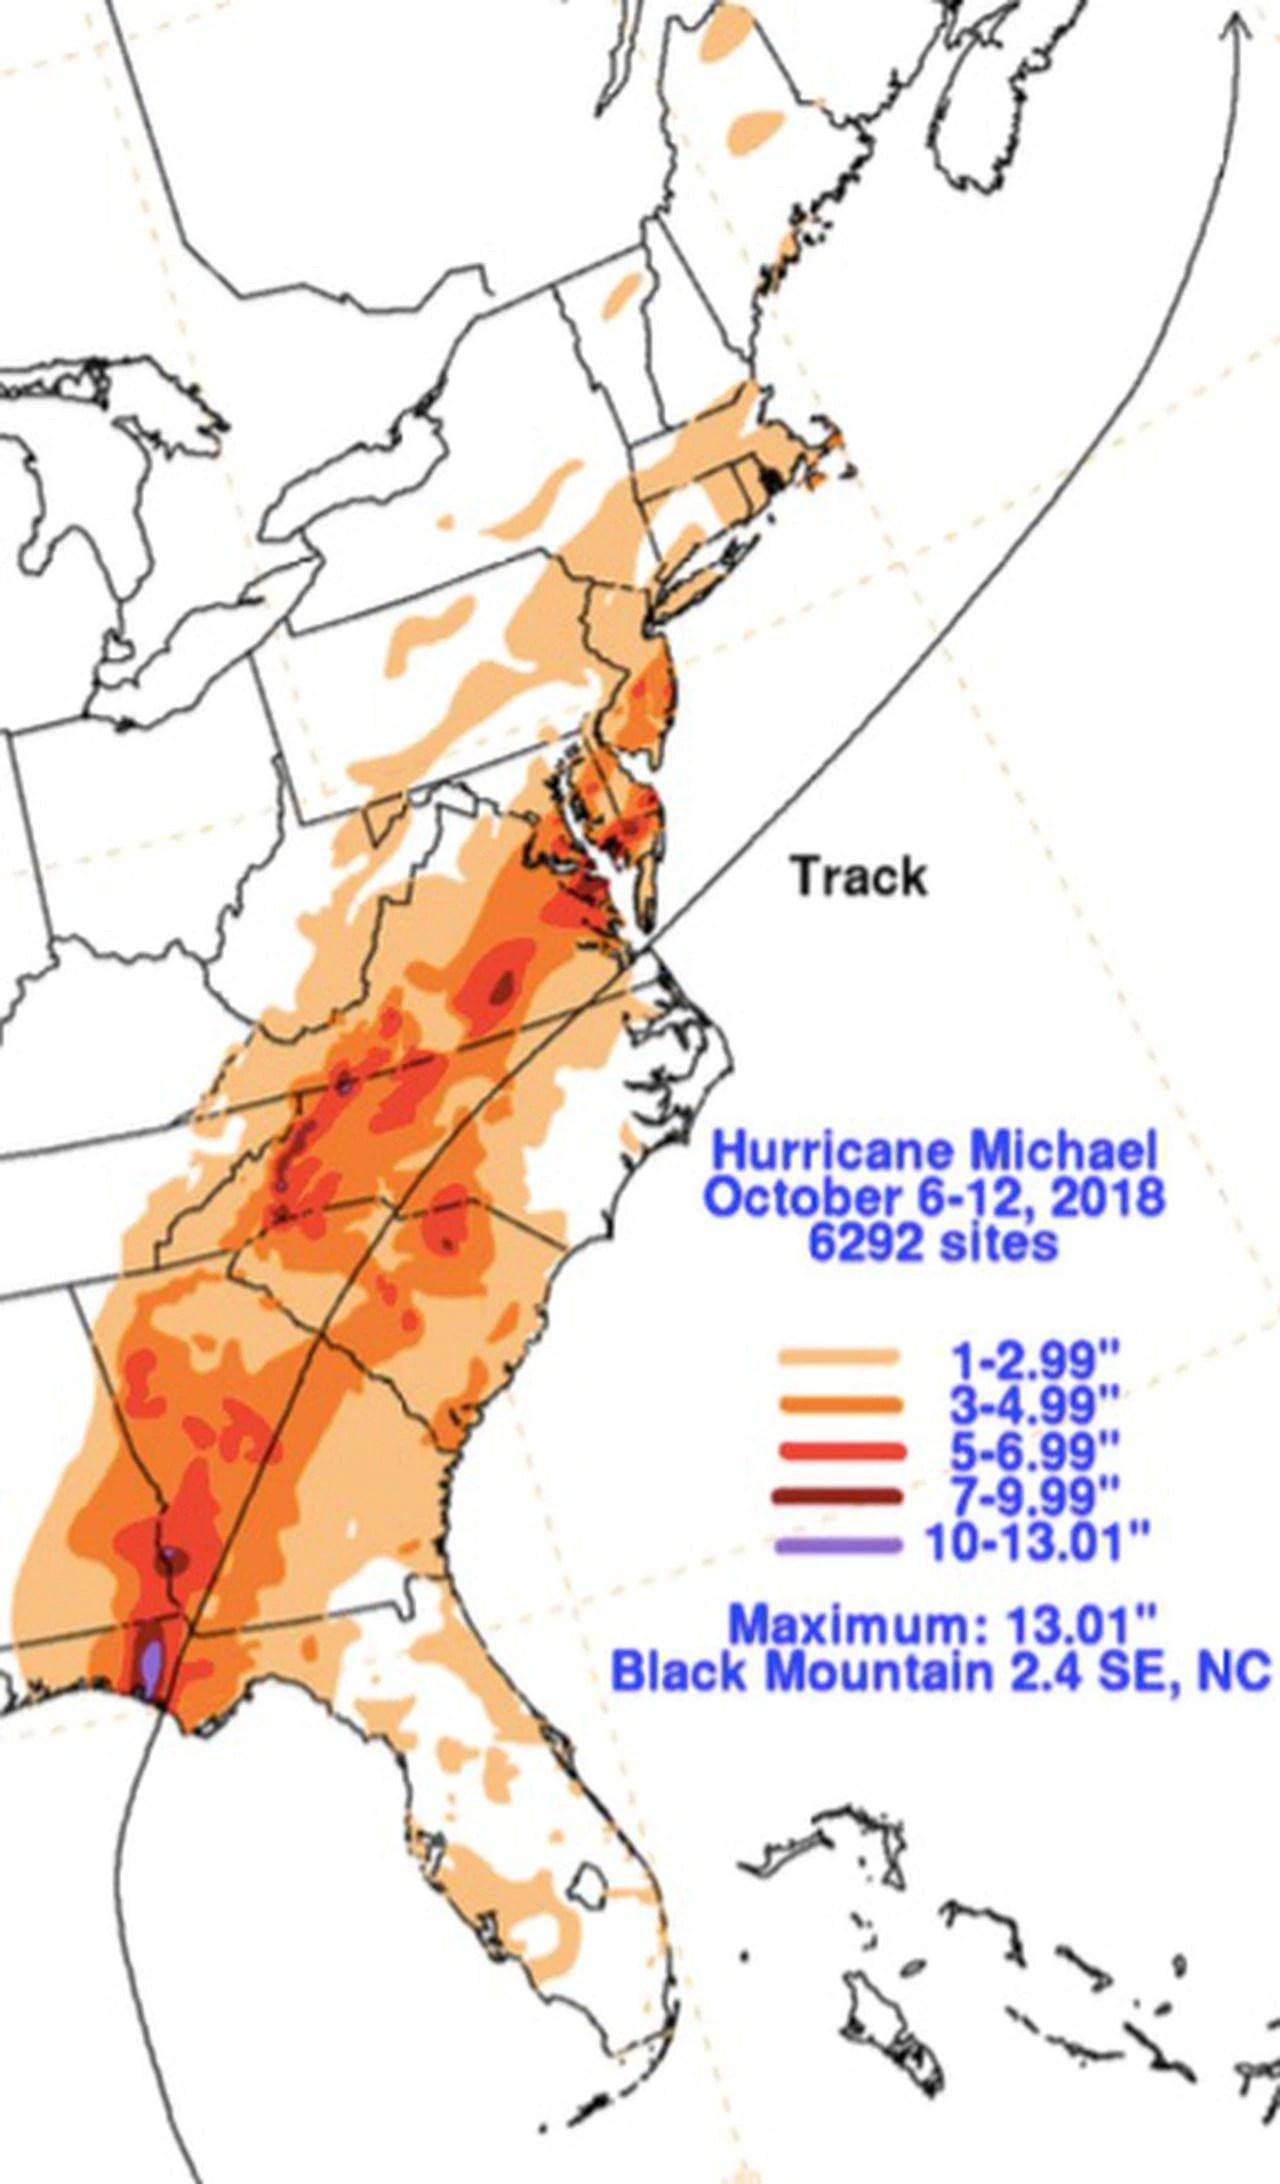 Map Of Hurricane Michael Damage : hurricane, michael, damage, Hurricane, Michael, Anniversary:, Category, Monster, Al.com